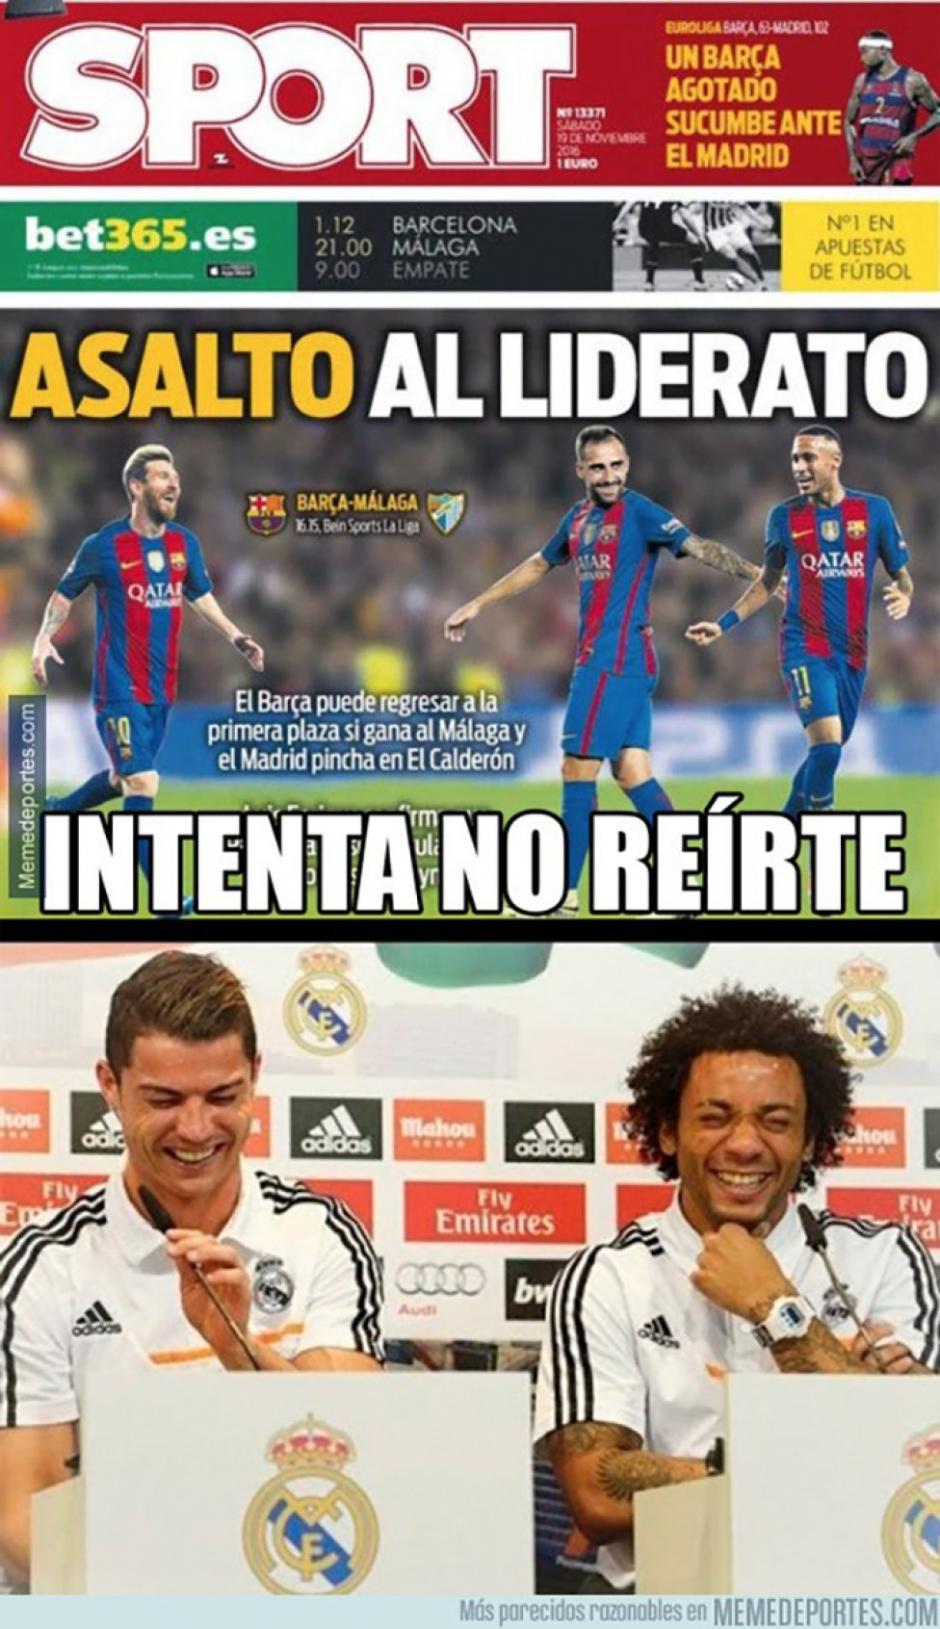 Las portadas fallidas en Barcelona. (Foto: Twitter)